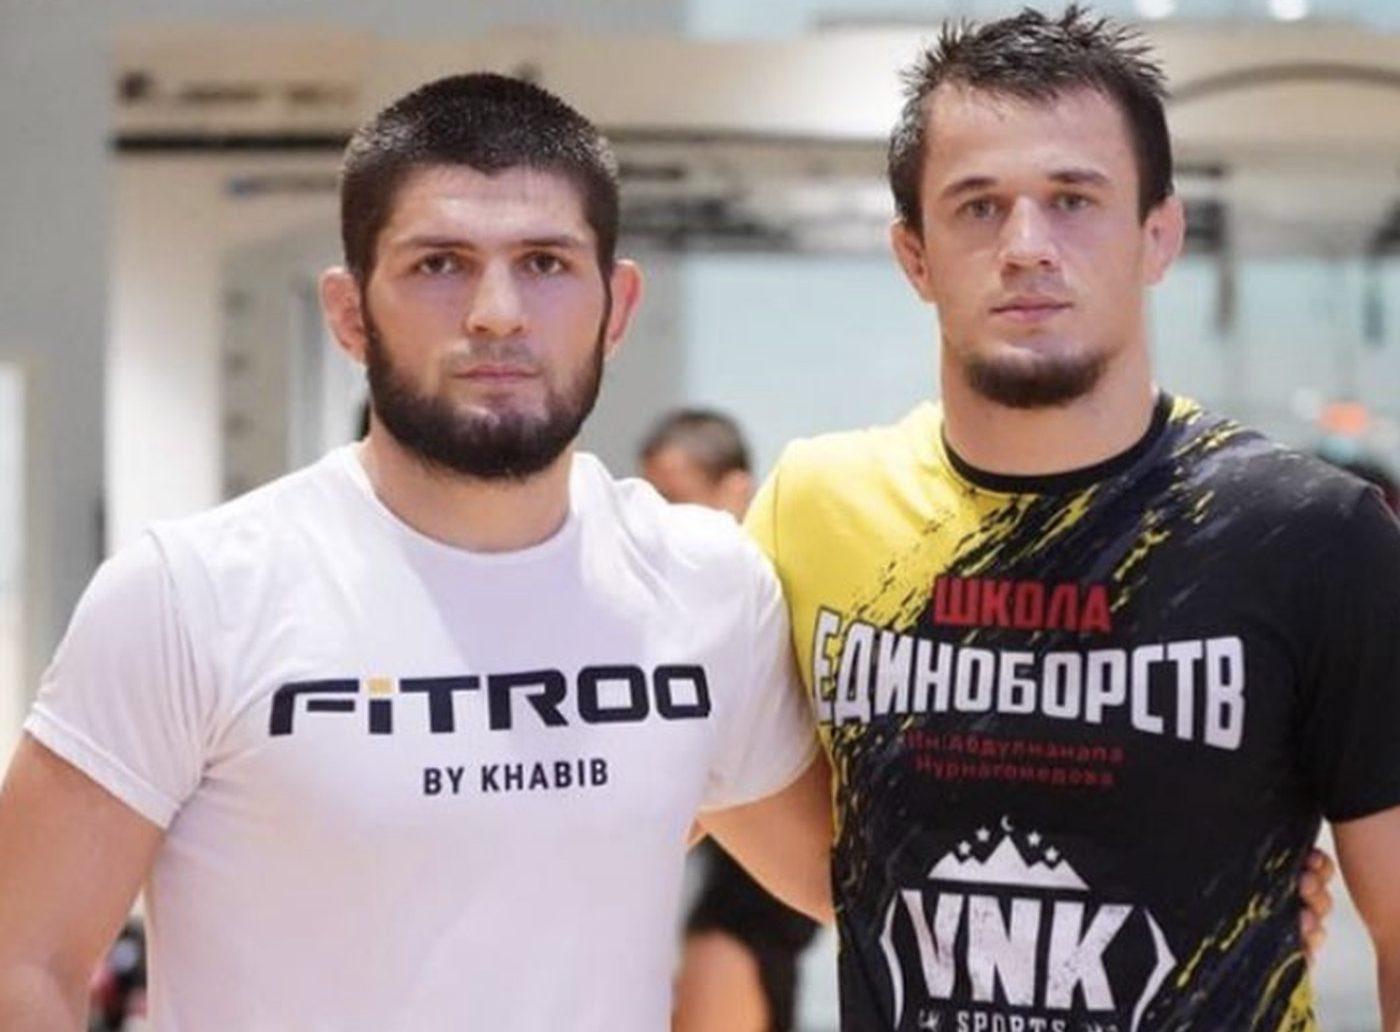 Usman and Khabib Nurmagomedov